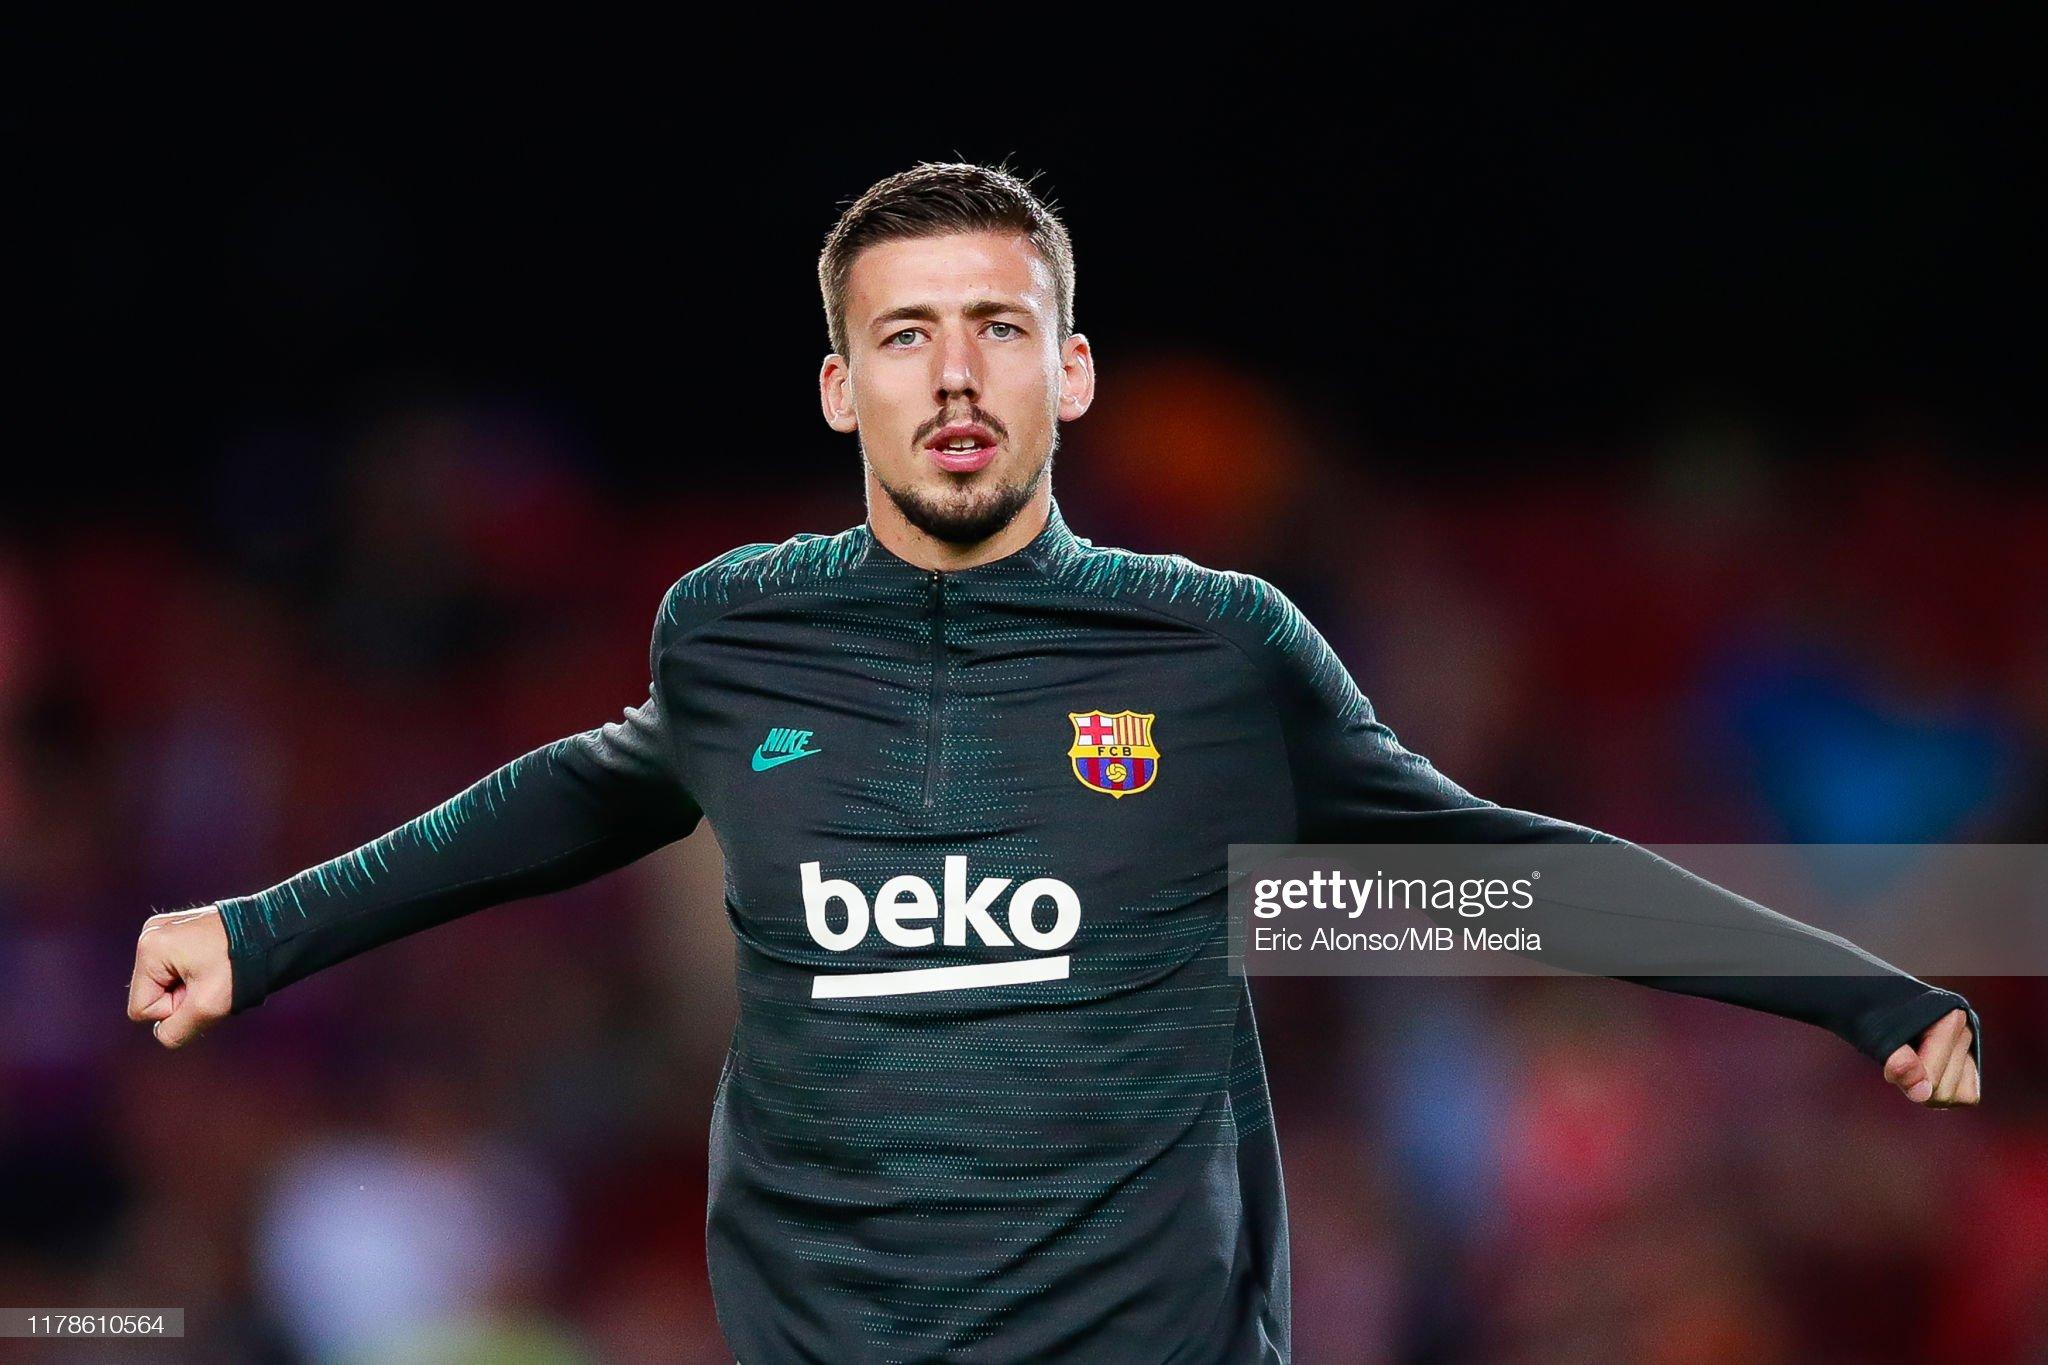 صور مباراة : برشلونة - إنتر 2-1 ( 02-10-2019 )  Clement-lenglet-of-fc-barcelona-during-the-warm-up-of-the-uefa-f-picture-id1178610564?s=2048x2048